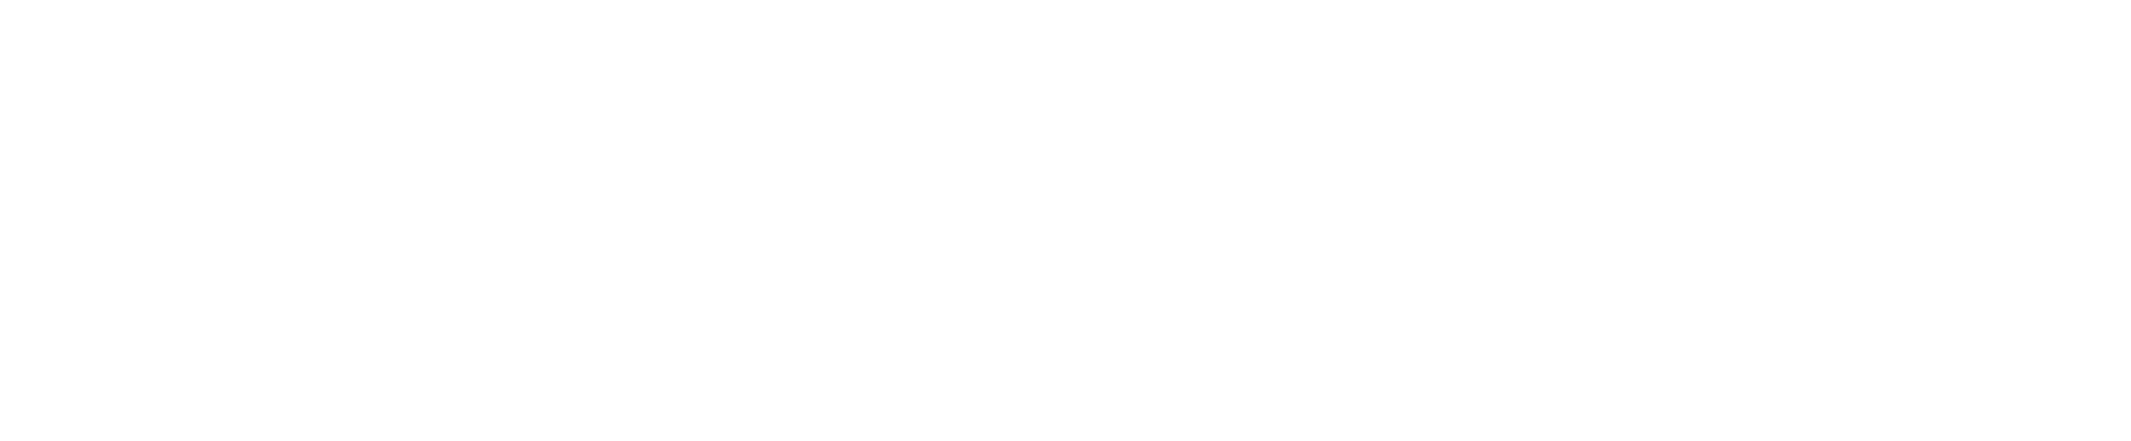 Grow-software